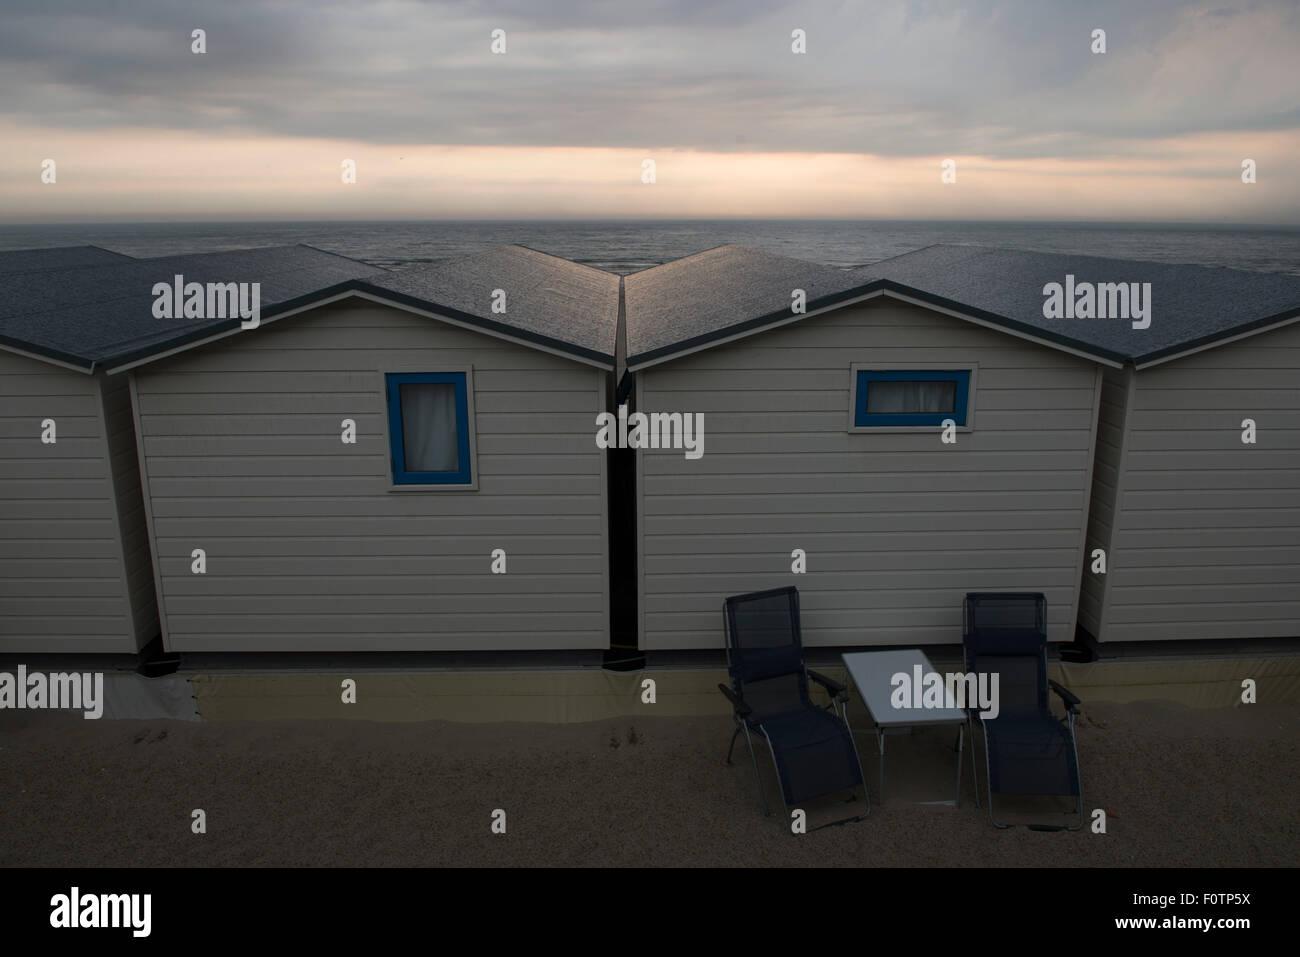 Holiday_behind the scene, rear view of beach houses, Wijk aan Zee, Netherlands - Stock Image